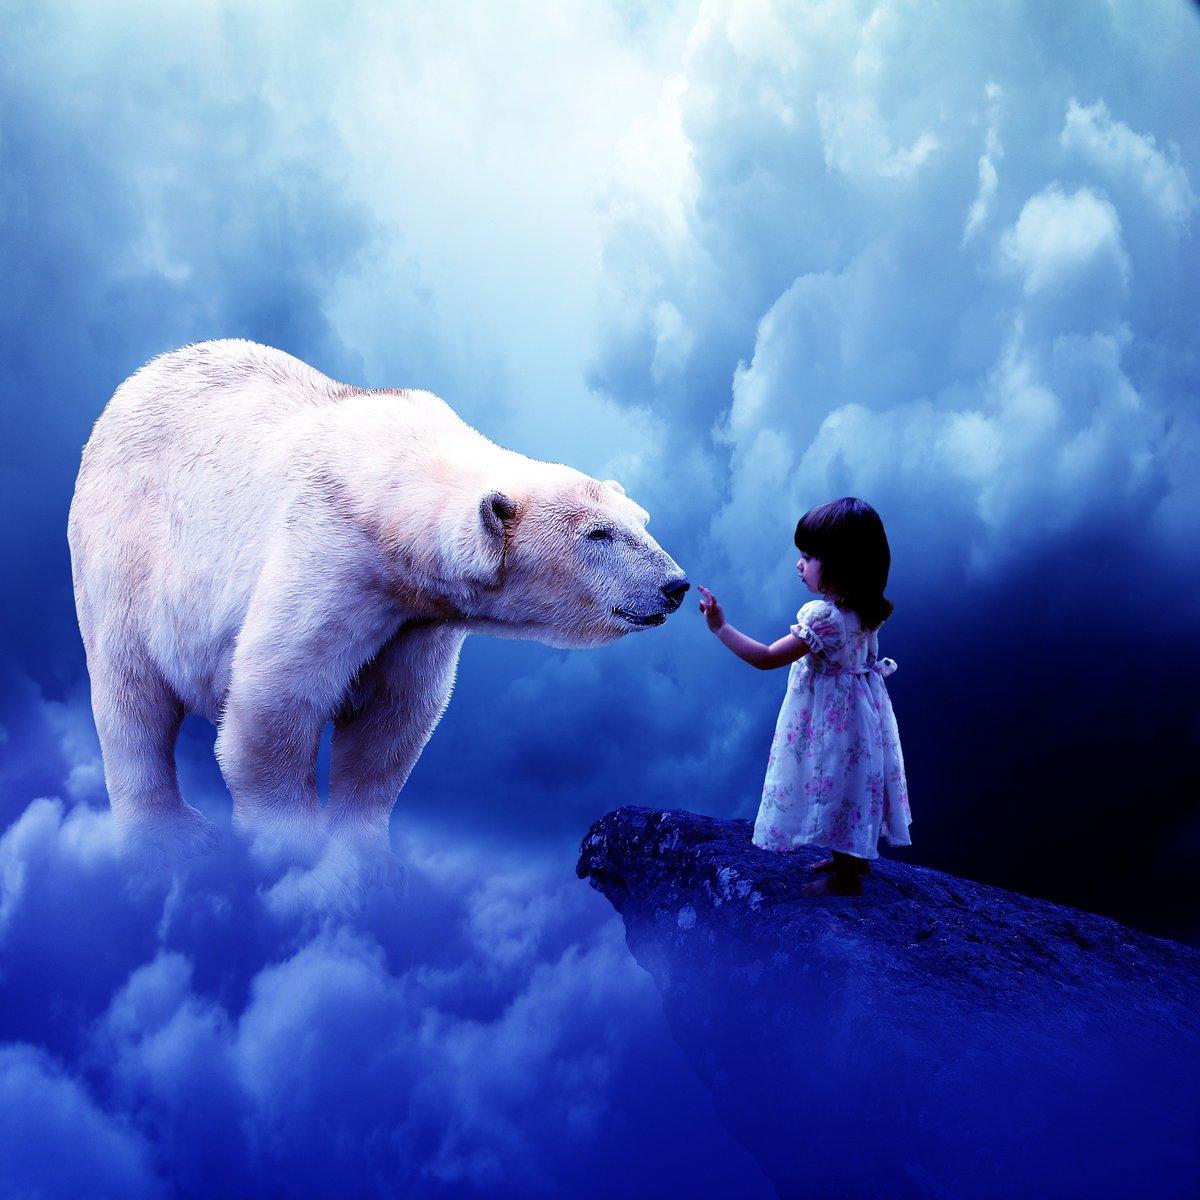 нам картинки белых медведей фэнтези почти